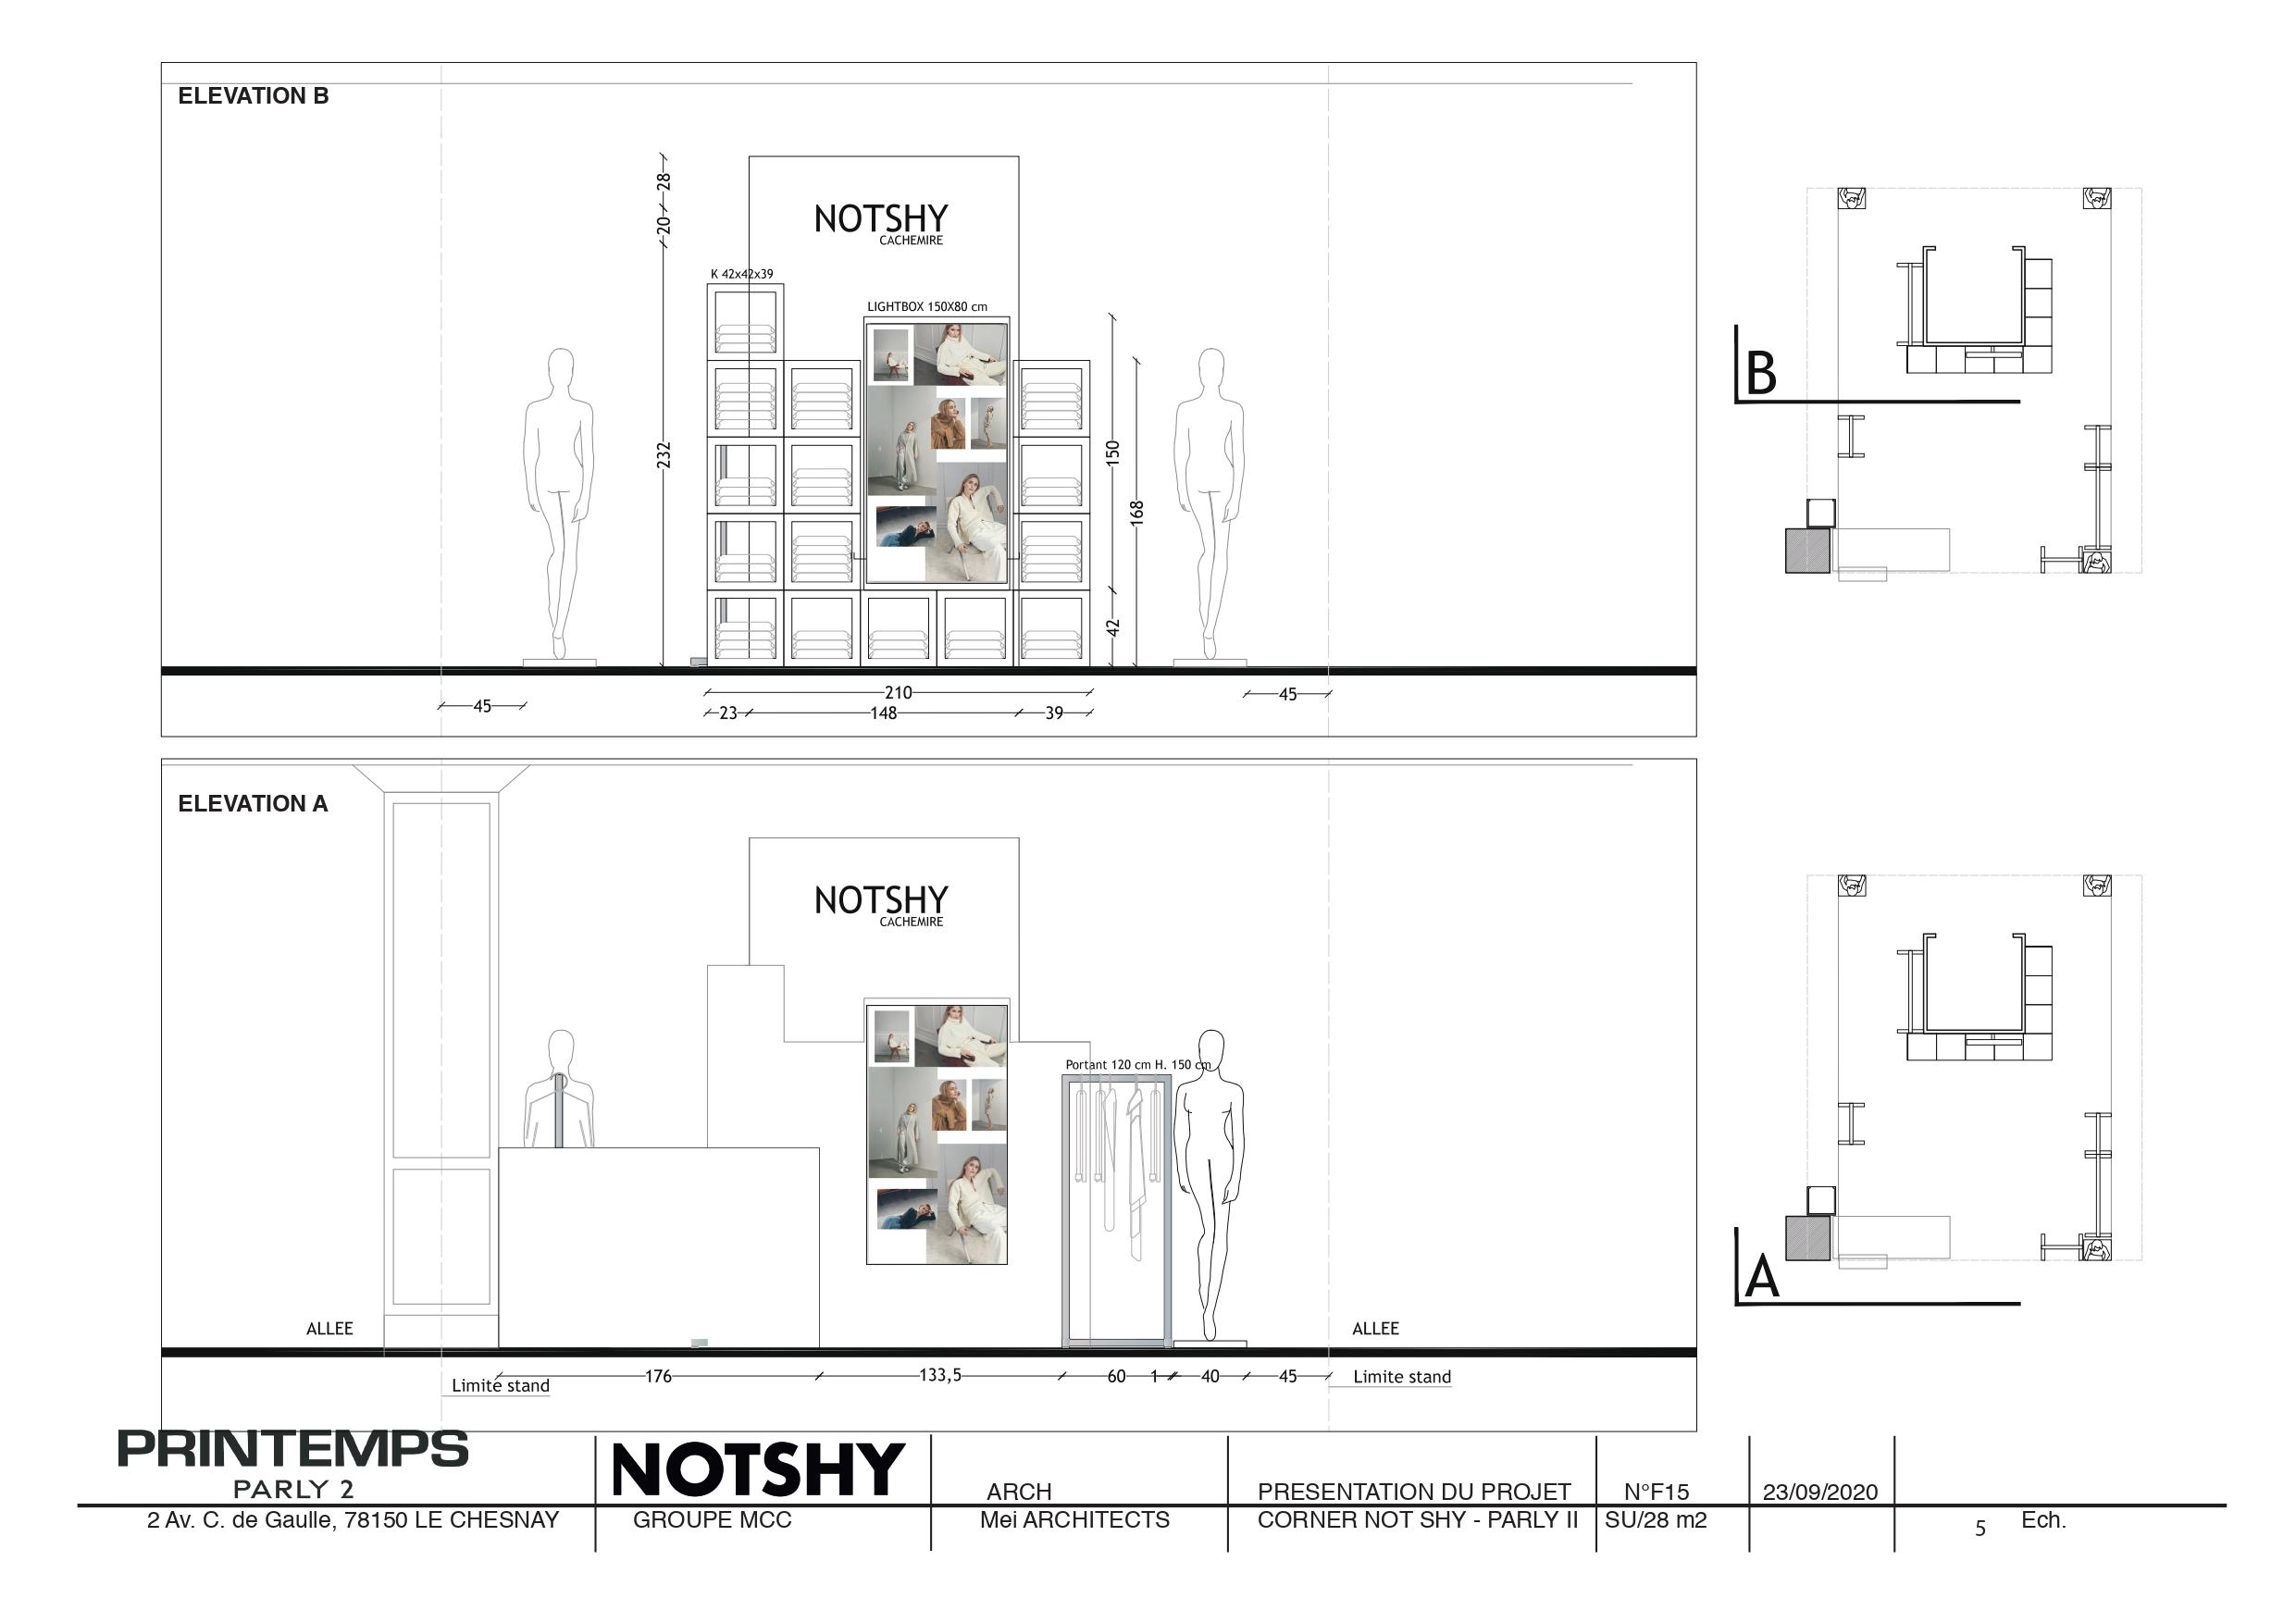 0925 PRESENTATION NOTSHY PARLY II-5_page